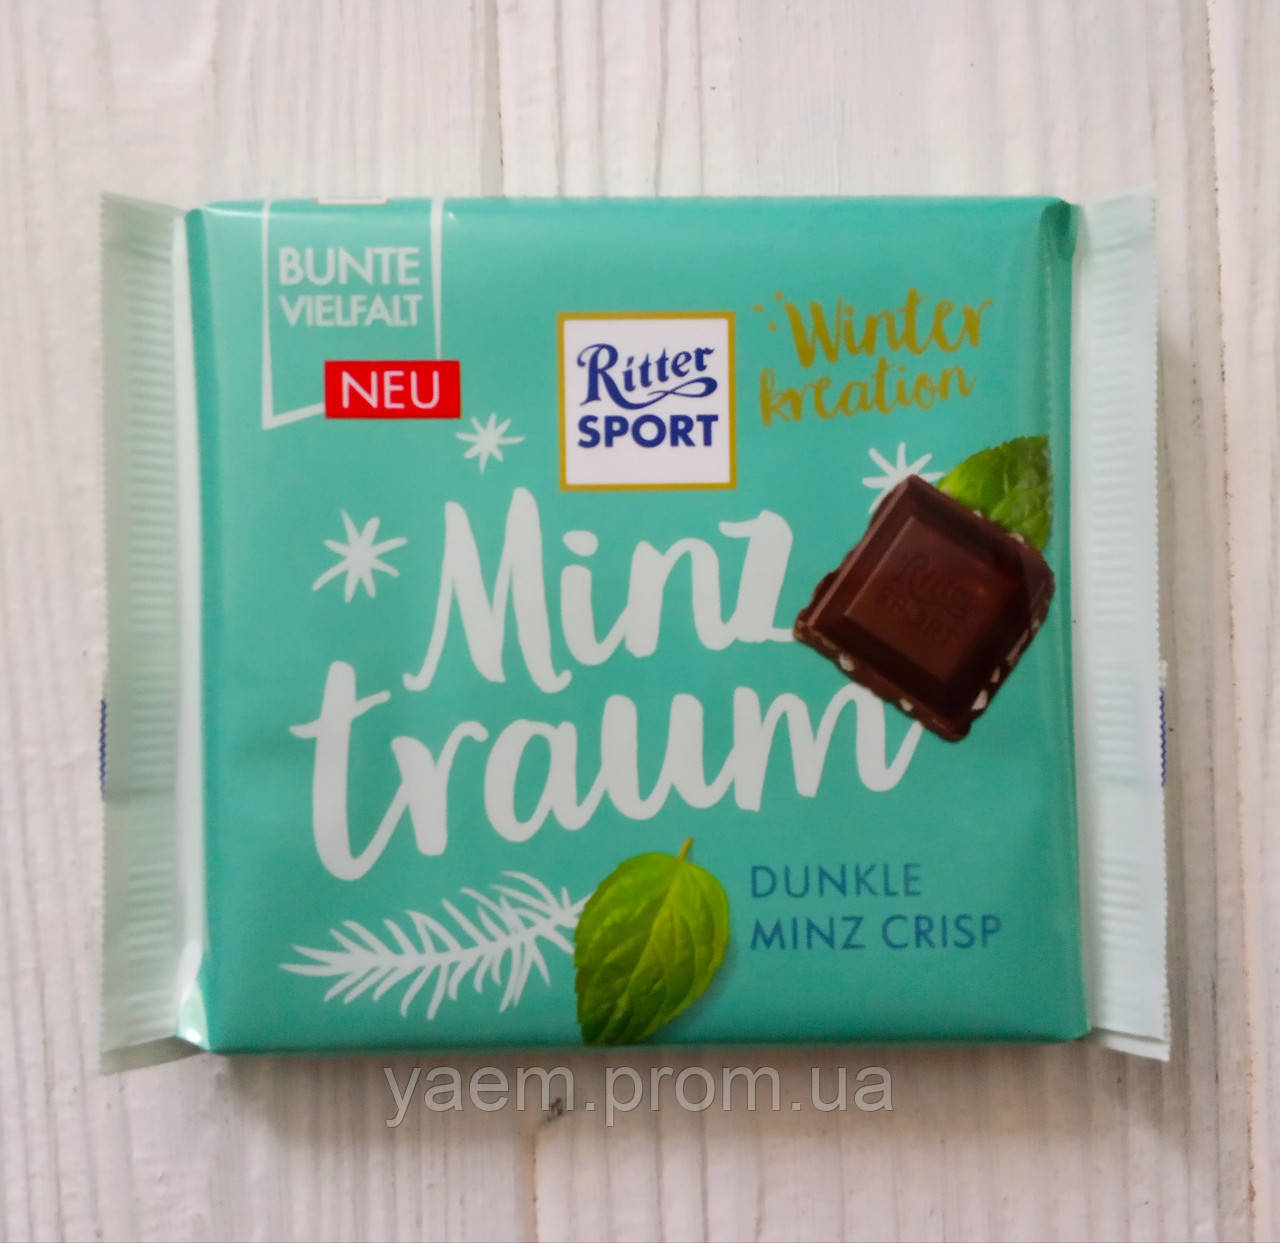 Шоколад Ritter Sport 100гр. (Германия) 100, Dunkle minz crisp (темный с хрустящей мятой)